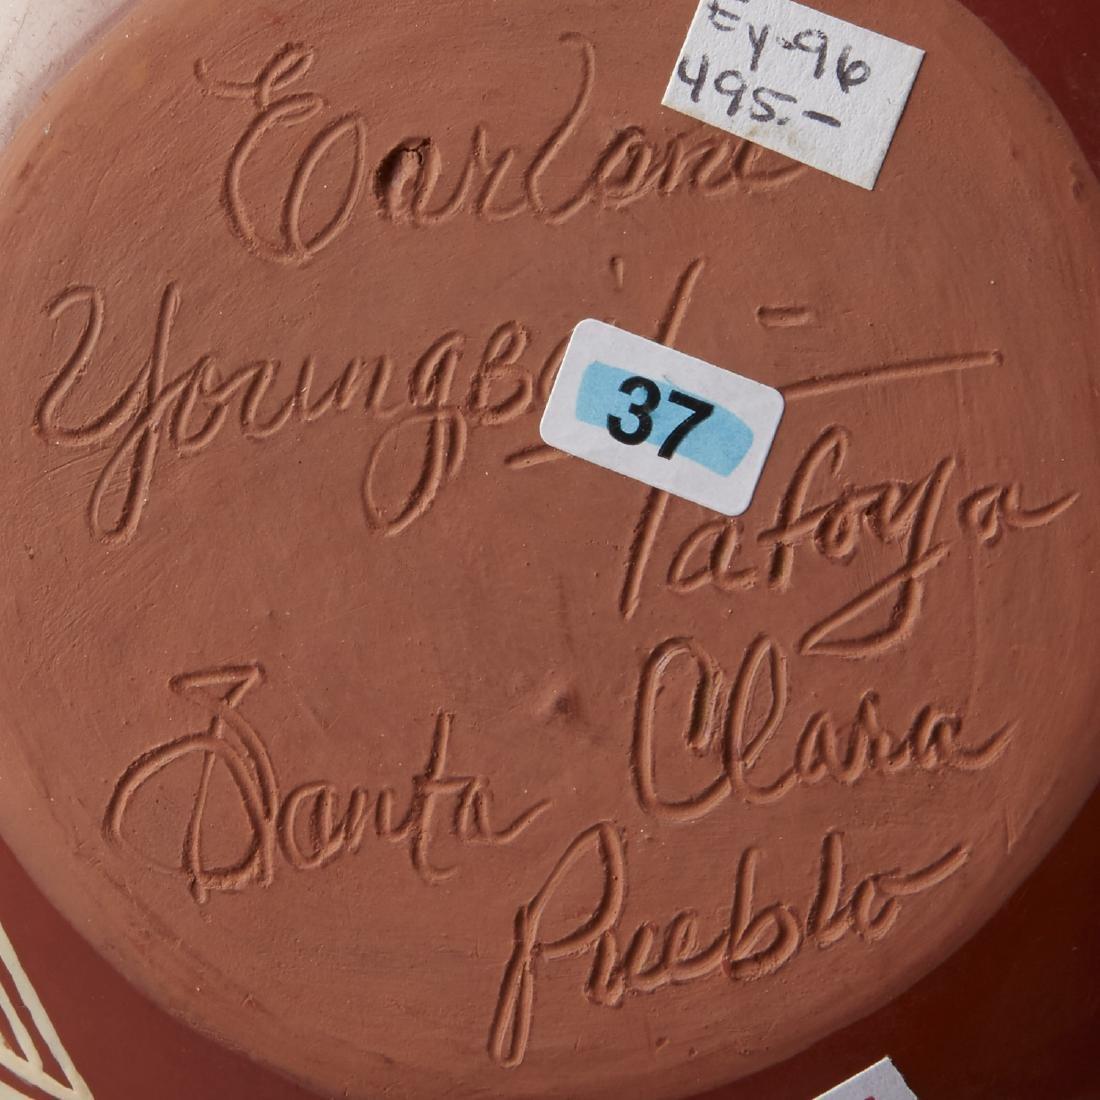 5 Santa Clara Redware Jars Tafoya, Gachapin - 7